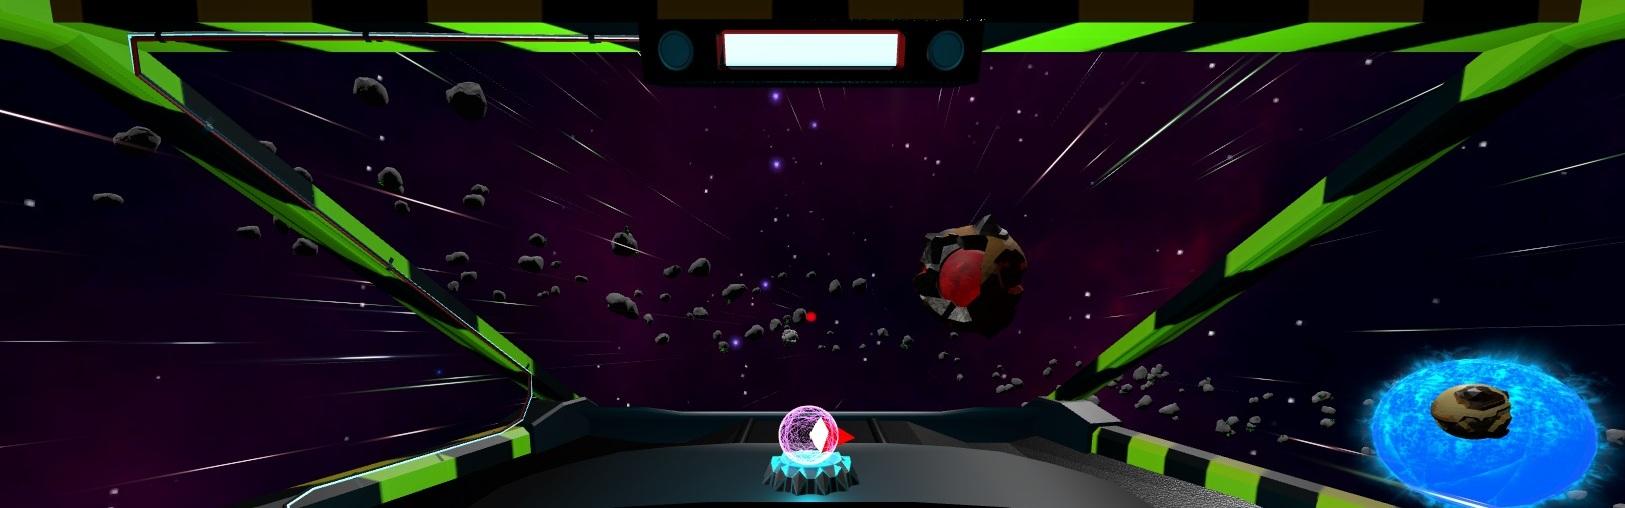 Space Slam [VR] Steam Key GLOBAL